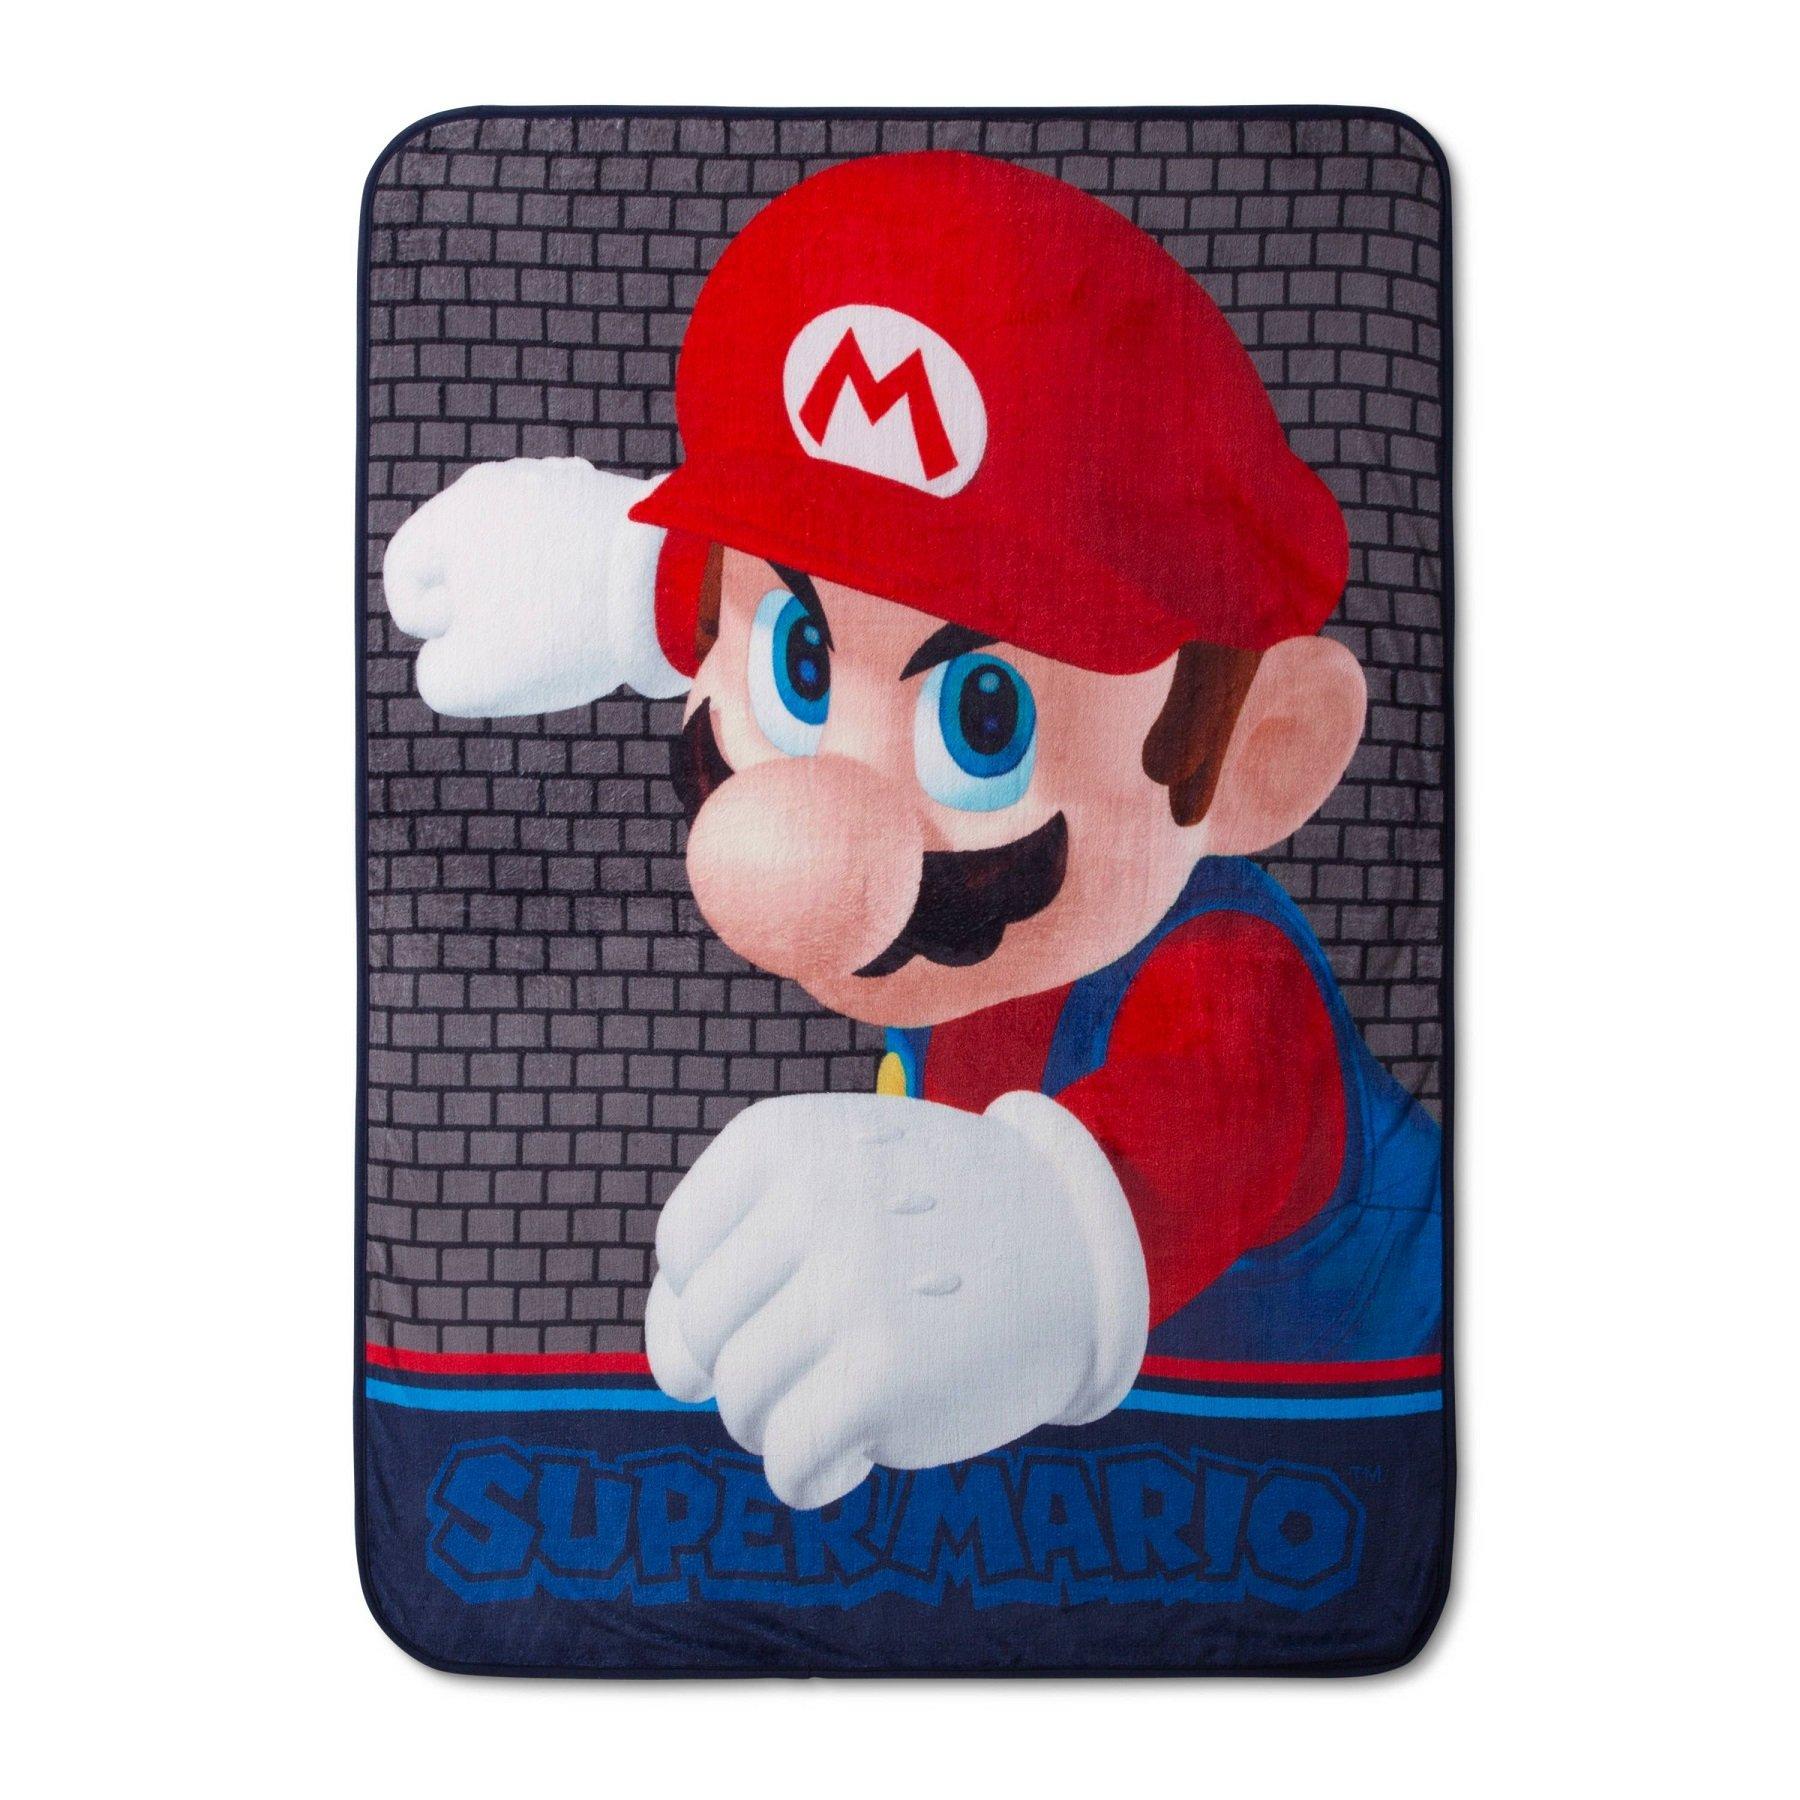 4c2df5f48c Get Quotations · Super Mario Brothers Kids Throw Blanket Plush 46x60